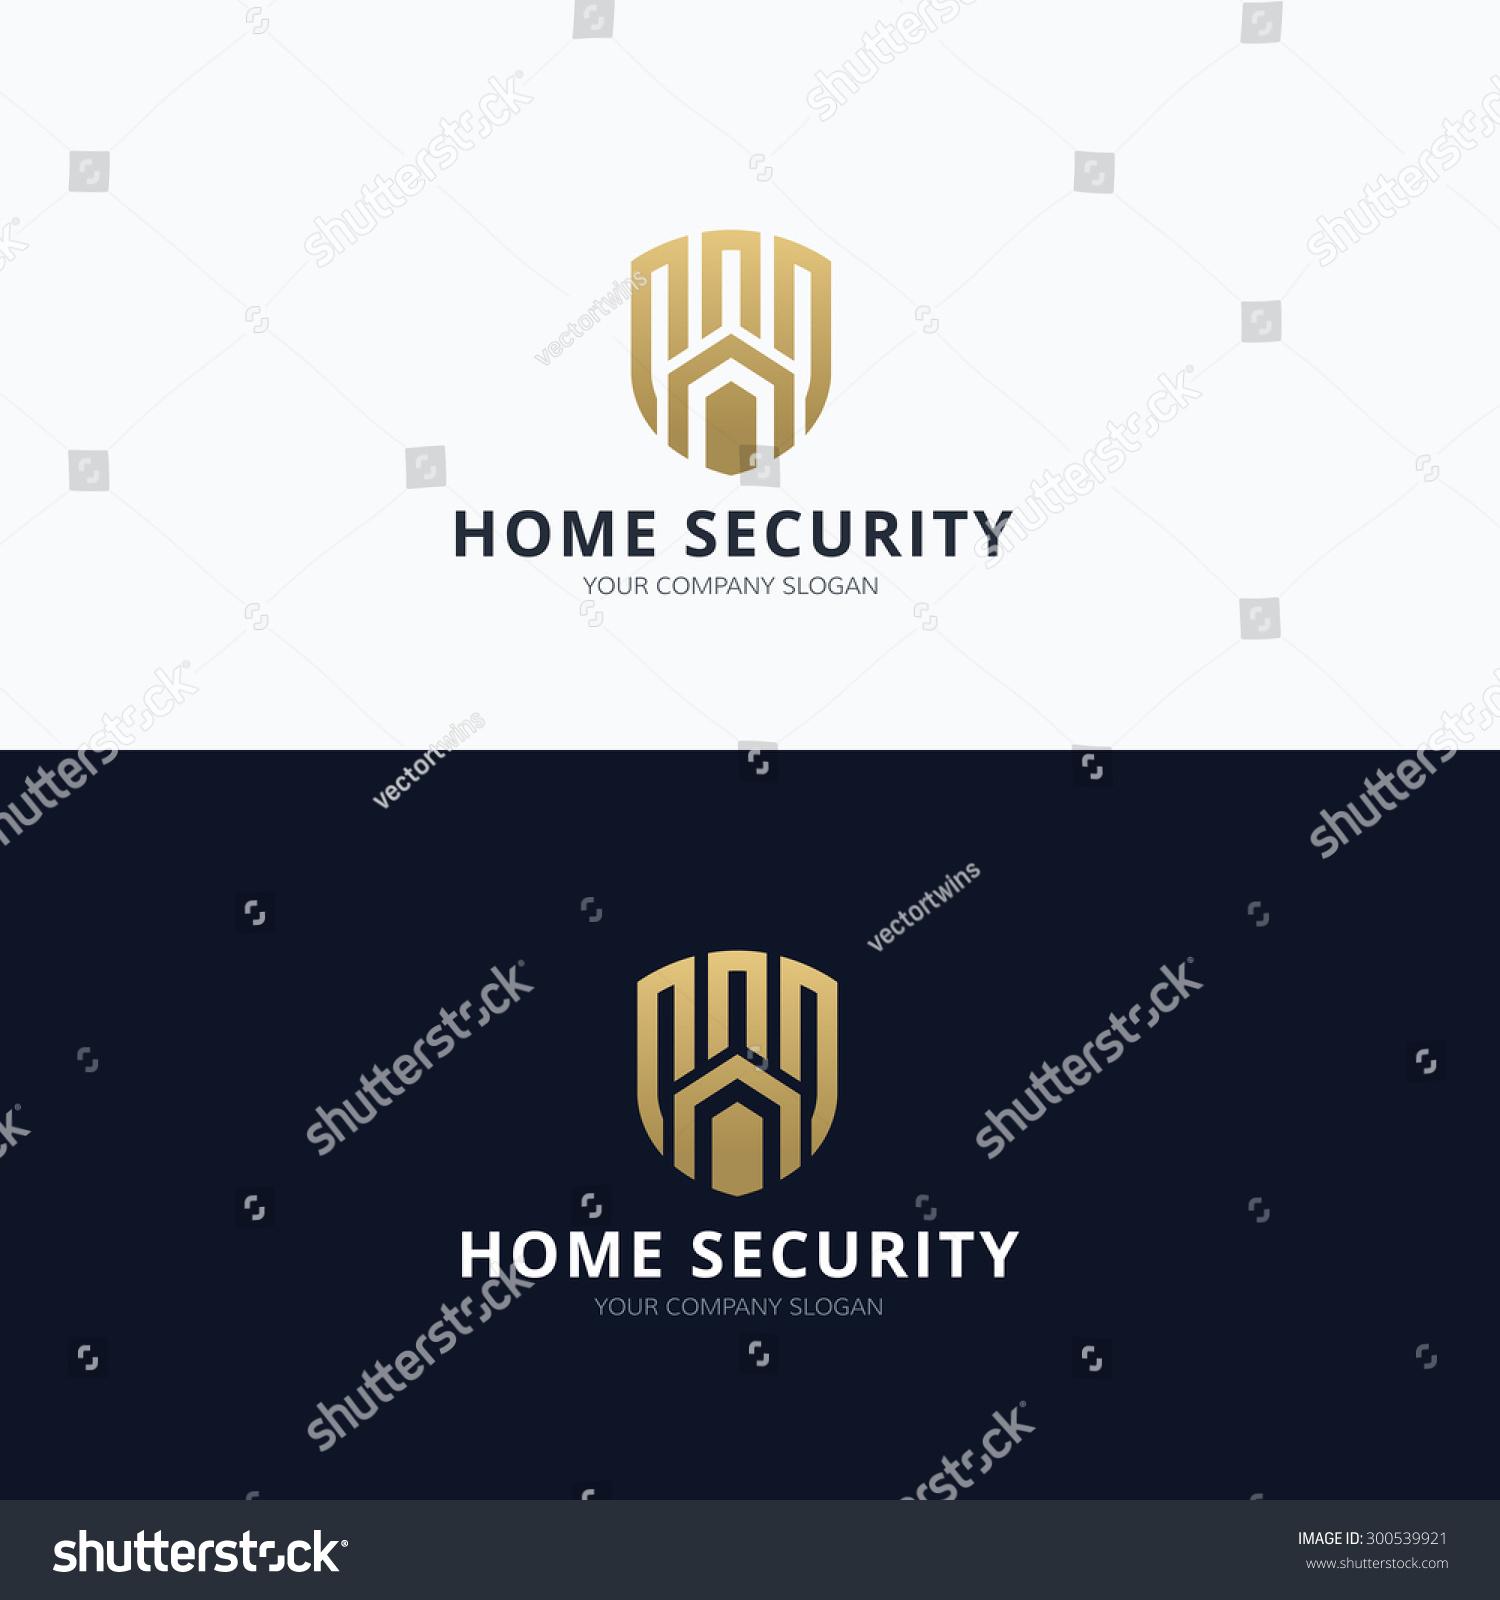 Arizona Department of Economic Security  Your Partner for